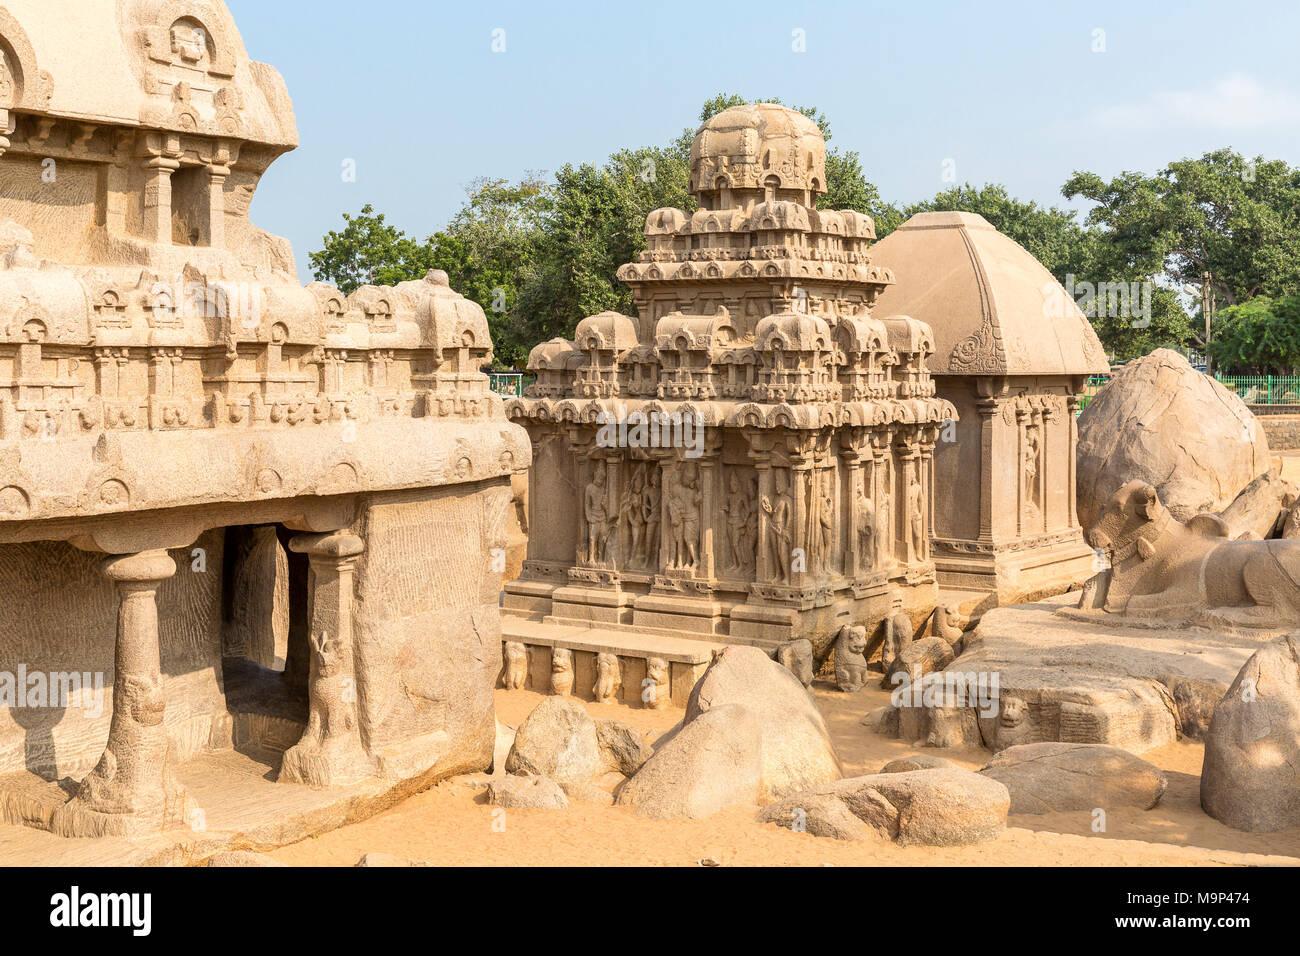 The Five Rathas, Arjuna ratha, Draupadi ratha, Mahabalipuram, Tamil Nadu, India - Stock Image